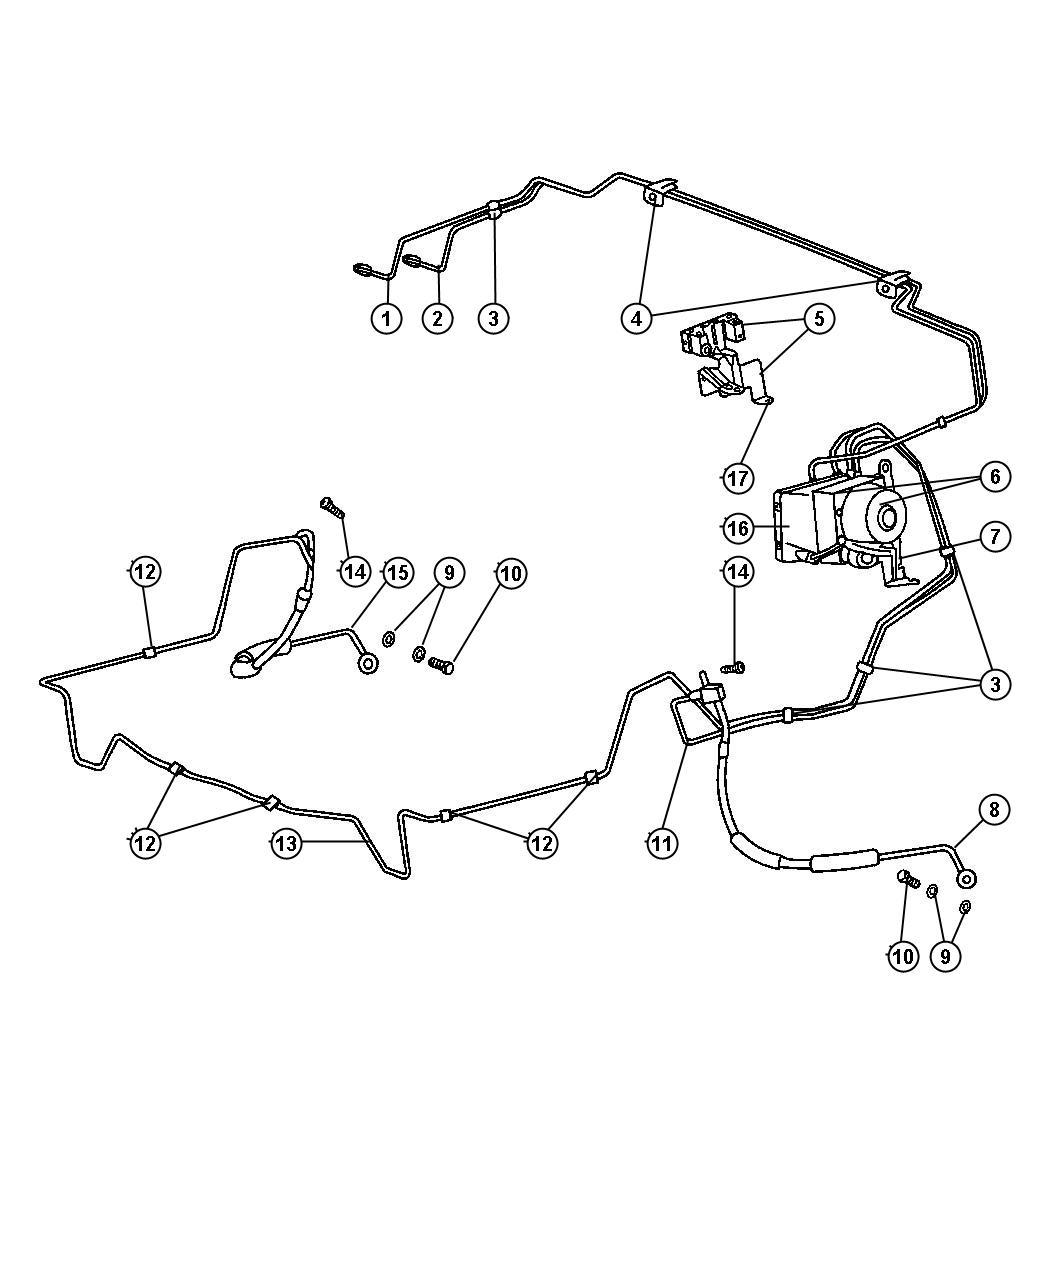 Jeep Liberty Block, valve. Brake line union, proportioning